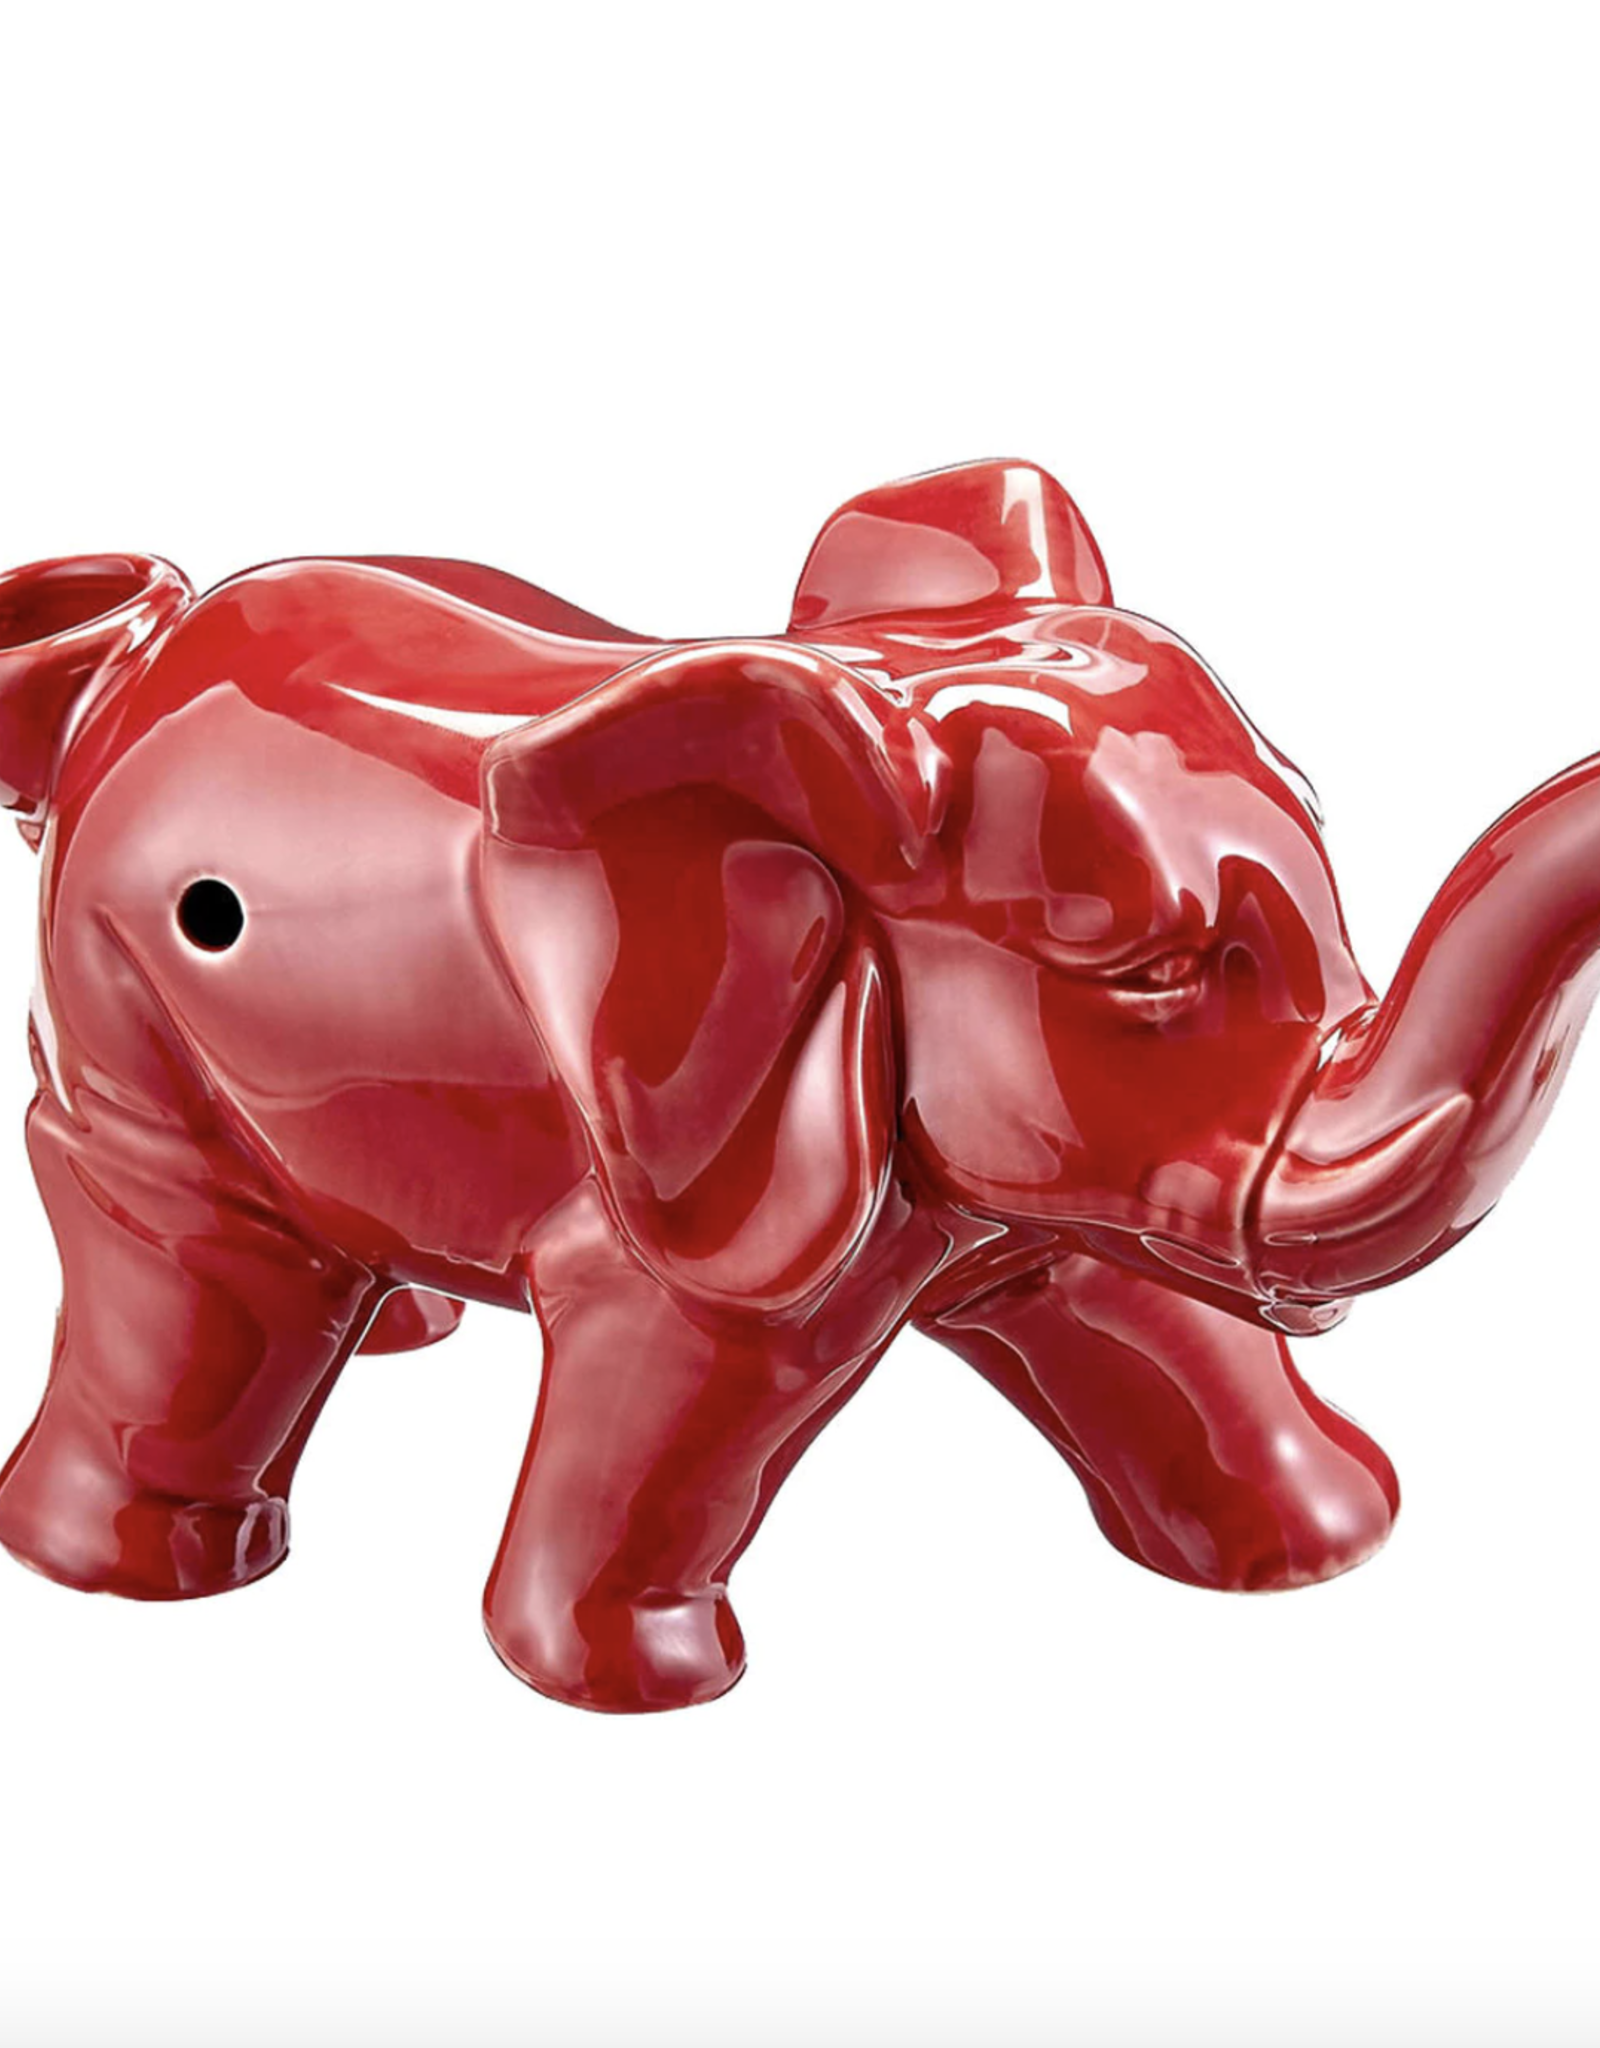 Ceramic Elephant Pipe - Red